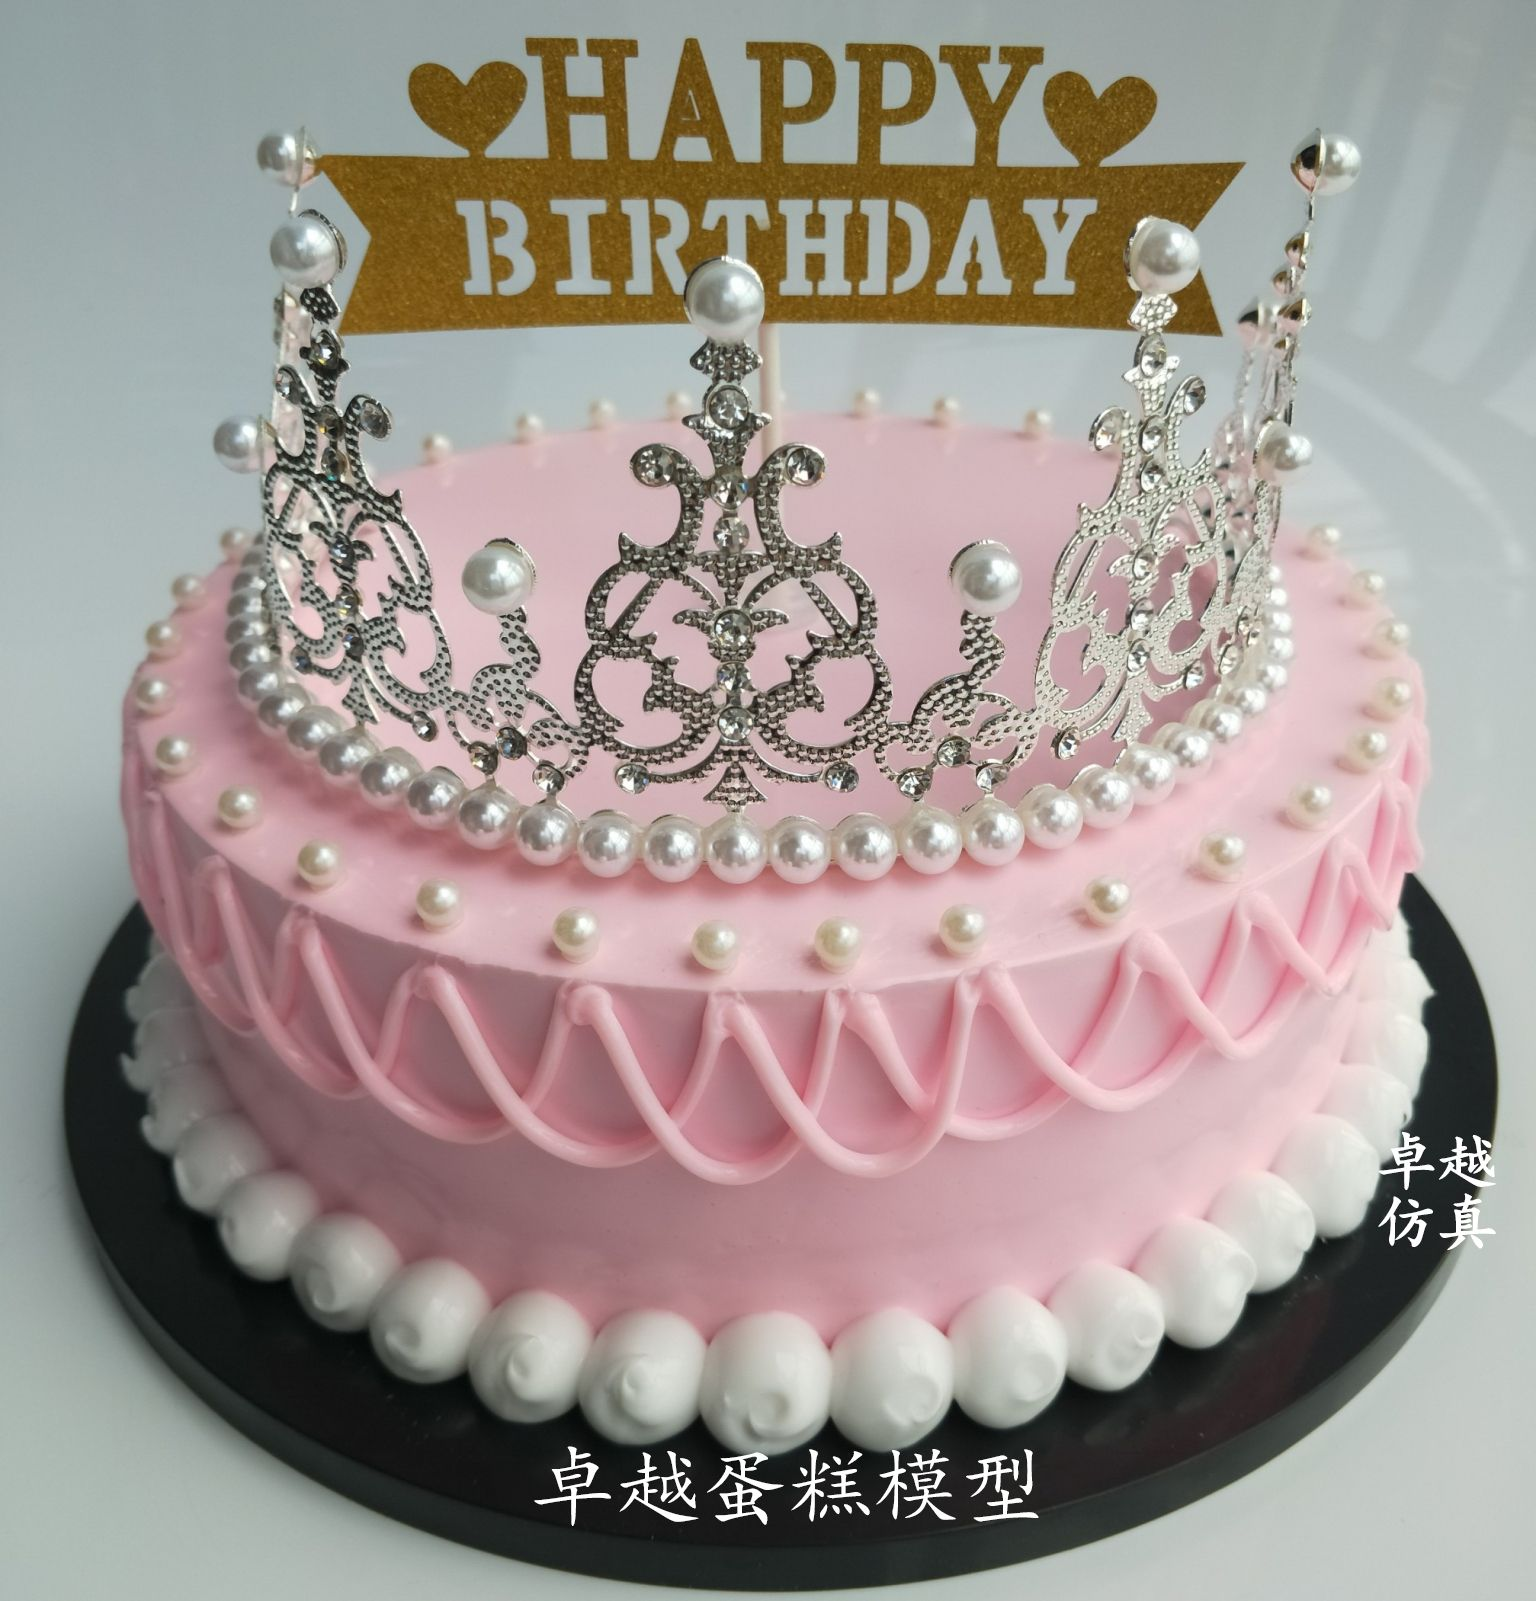 27 Amazing Image Of Crown Birthday Cake Crown Birthday Cake Usd 2464 Simulation Cake Model C Birthday Cake Crown Queens Birthday Cake Princess Birthday Cake